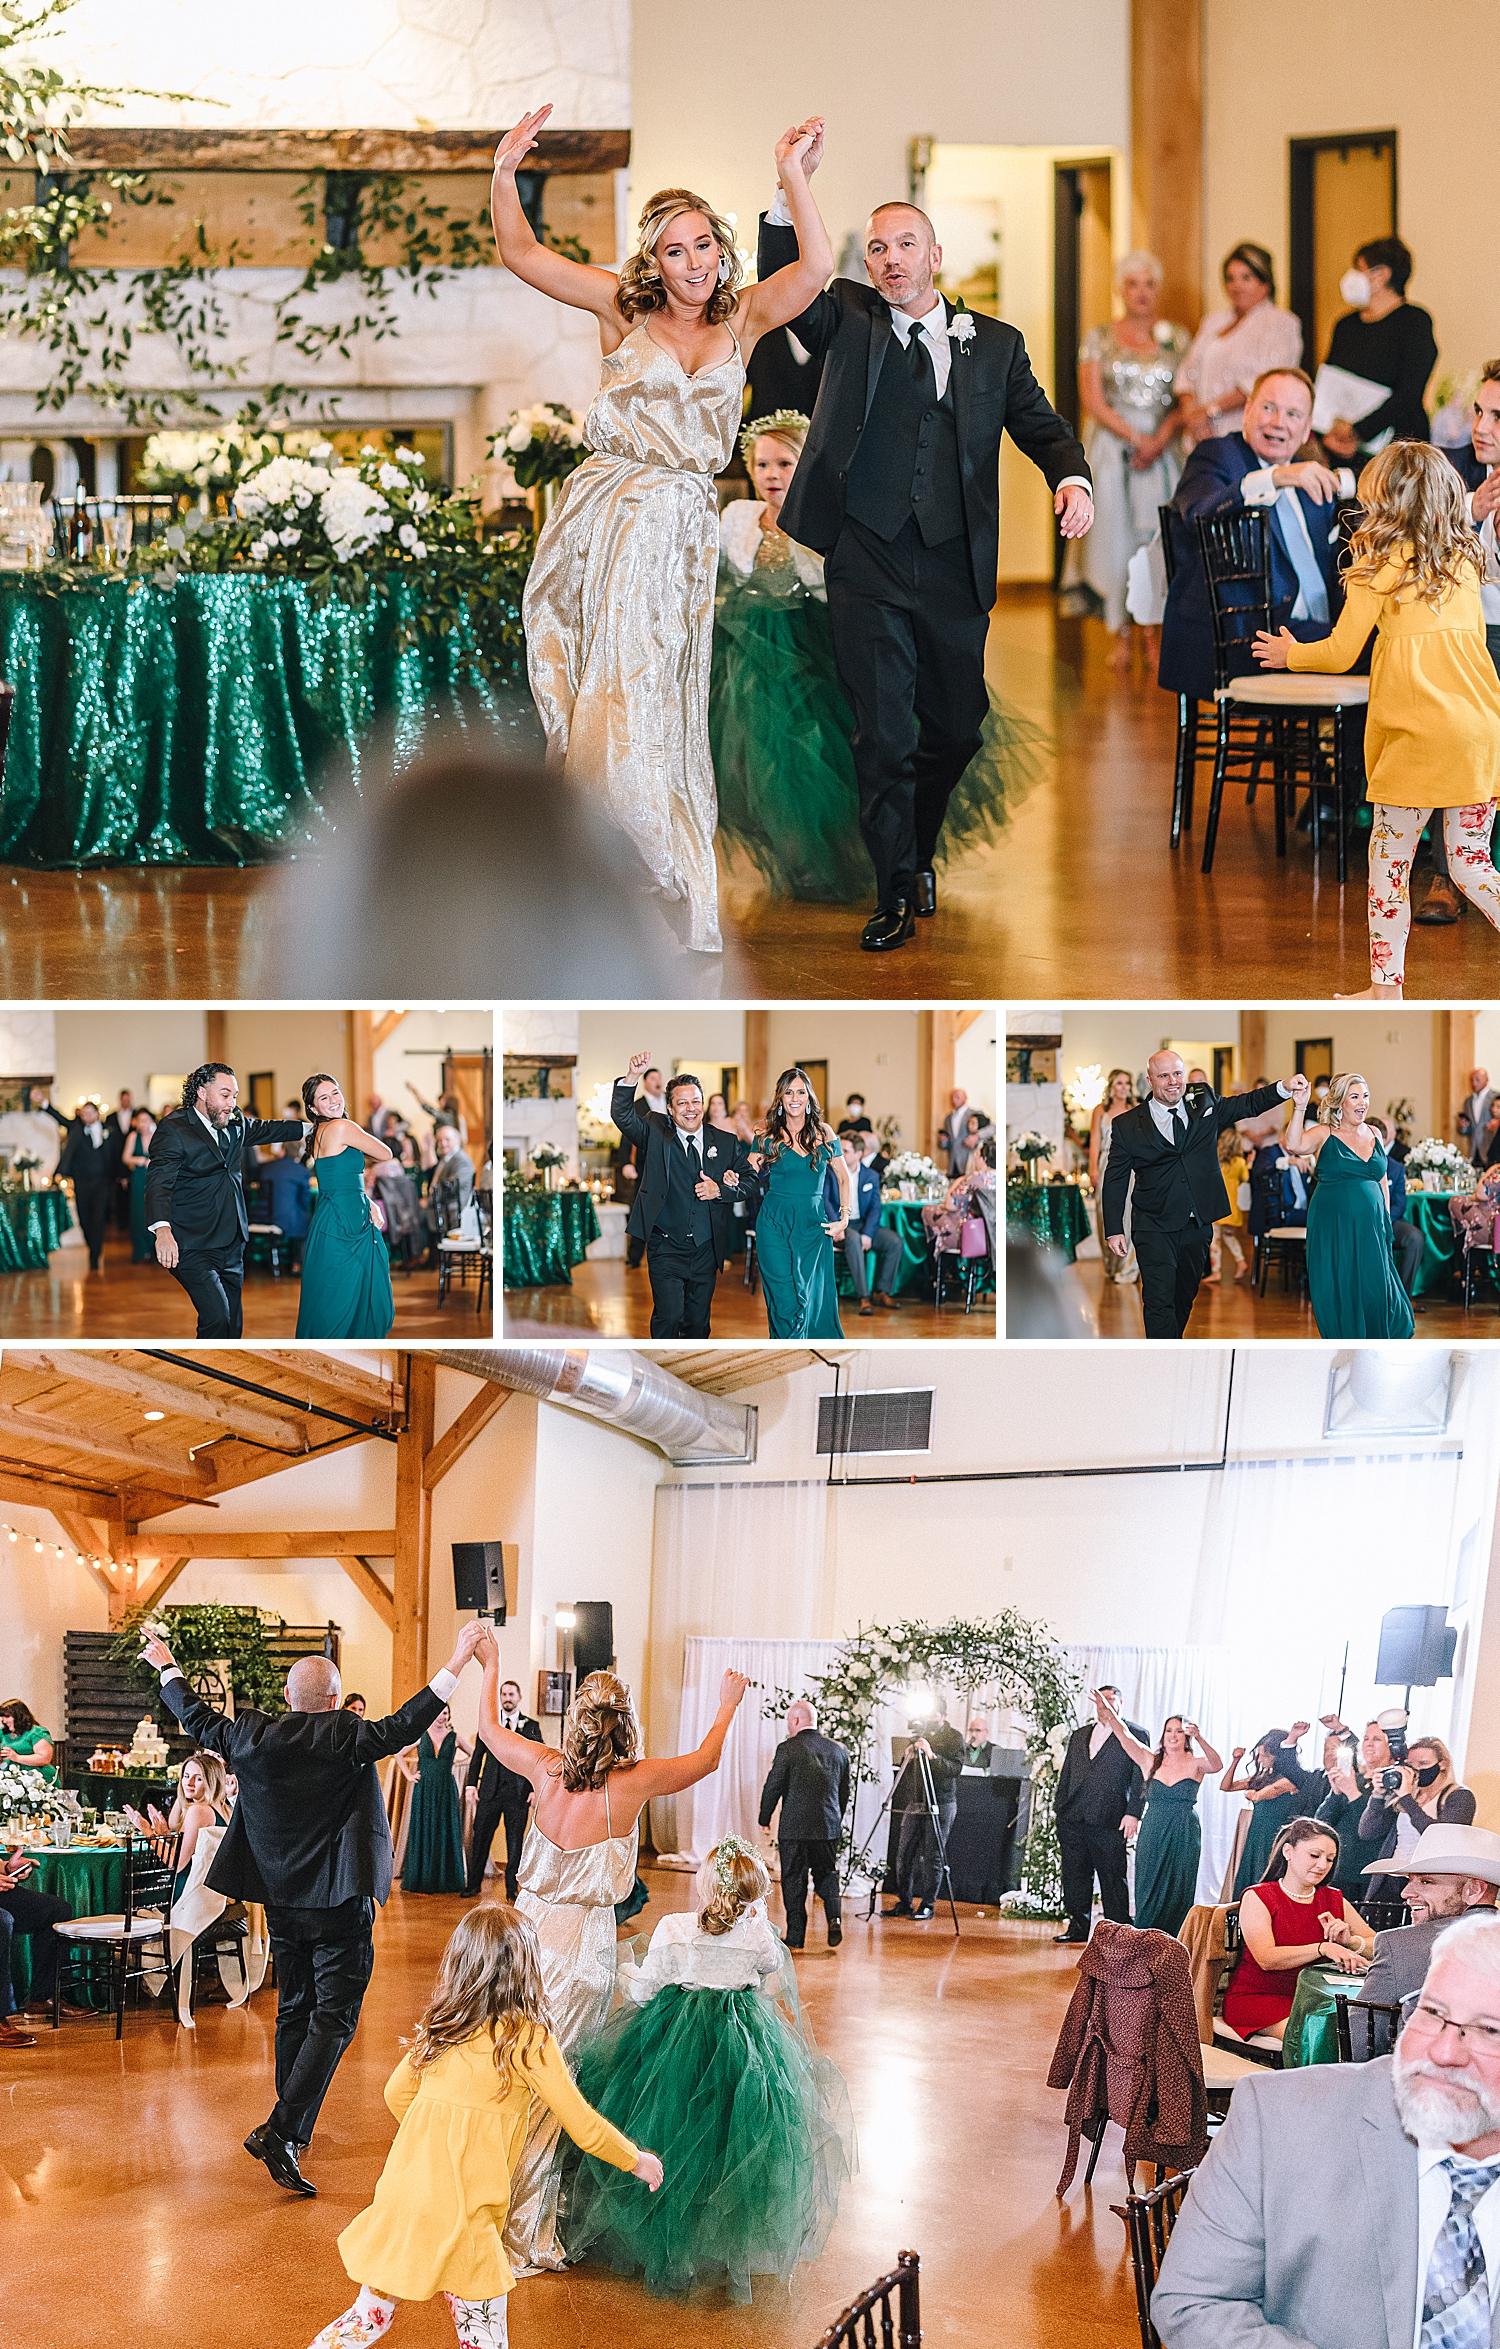 Magnolia-Halle-Wedding-San-Antonio-Texas-Bride-Grom_0080.jpg